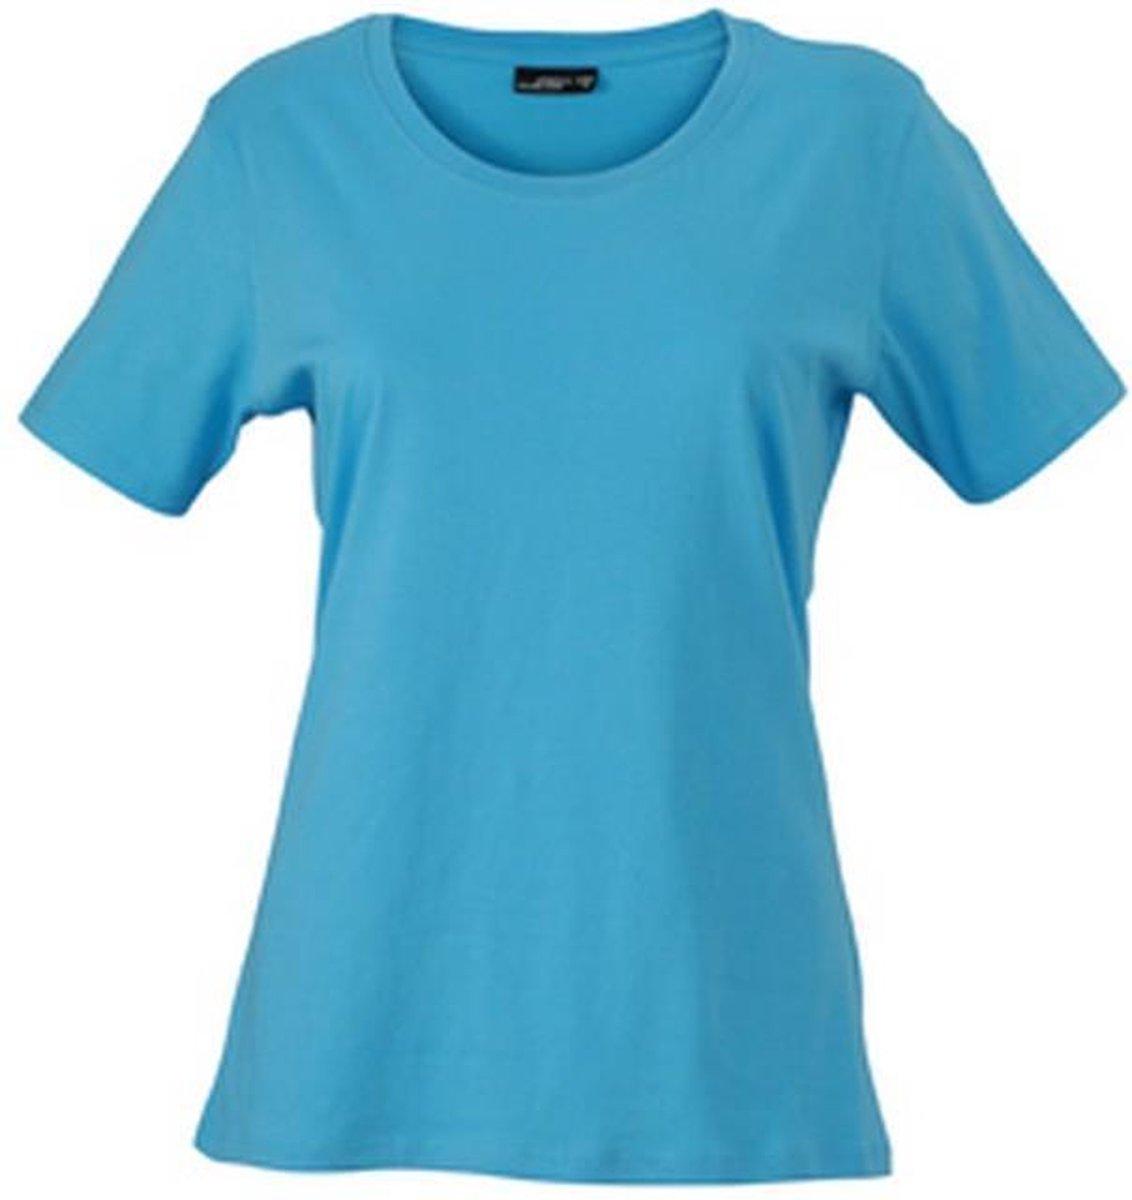 James and Nicholson Dames/dames Basic T-Shirt (Hemelsblauw)